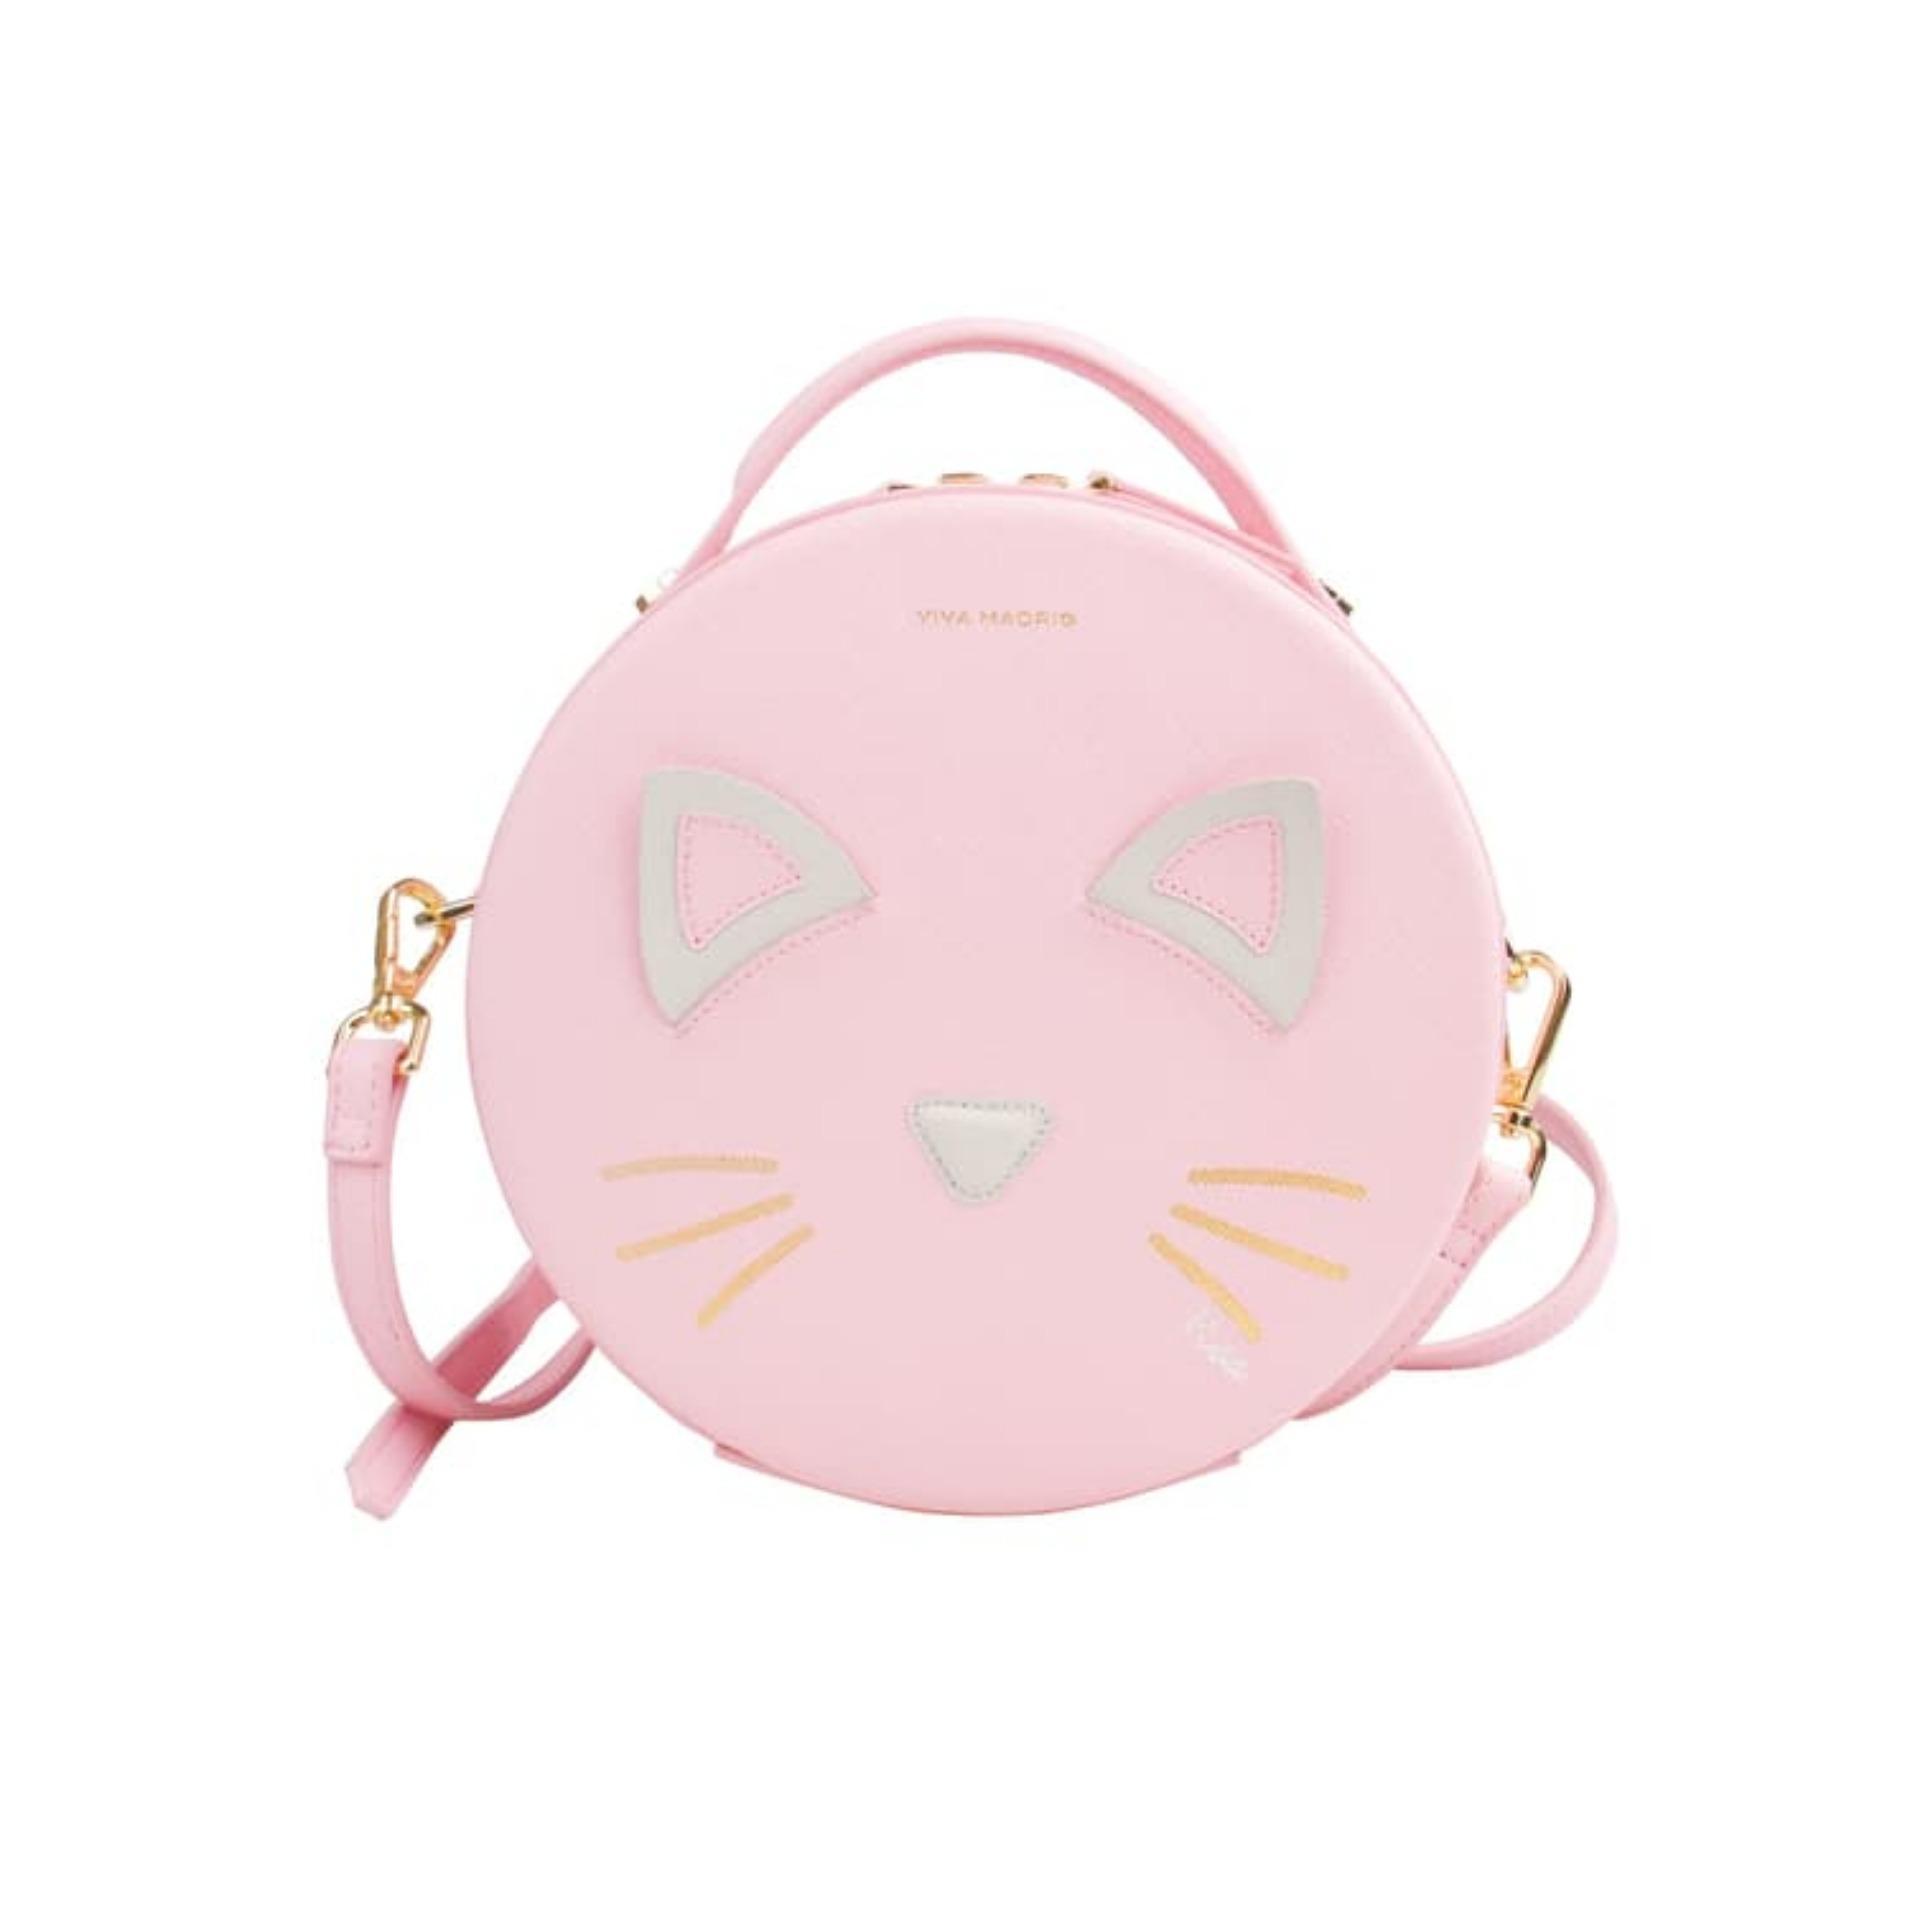 Viva Madrid Mascota Sling Bag Puss In Love - Pink